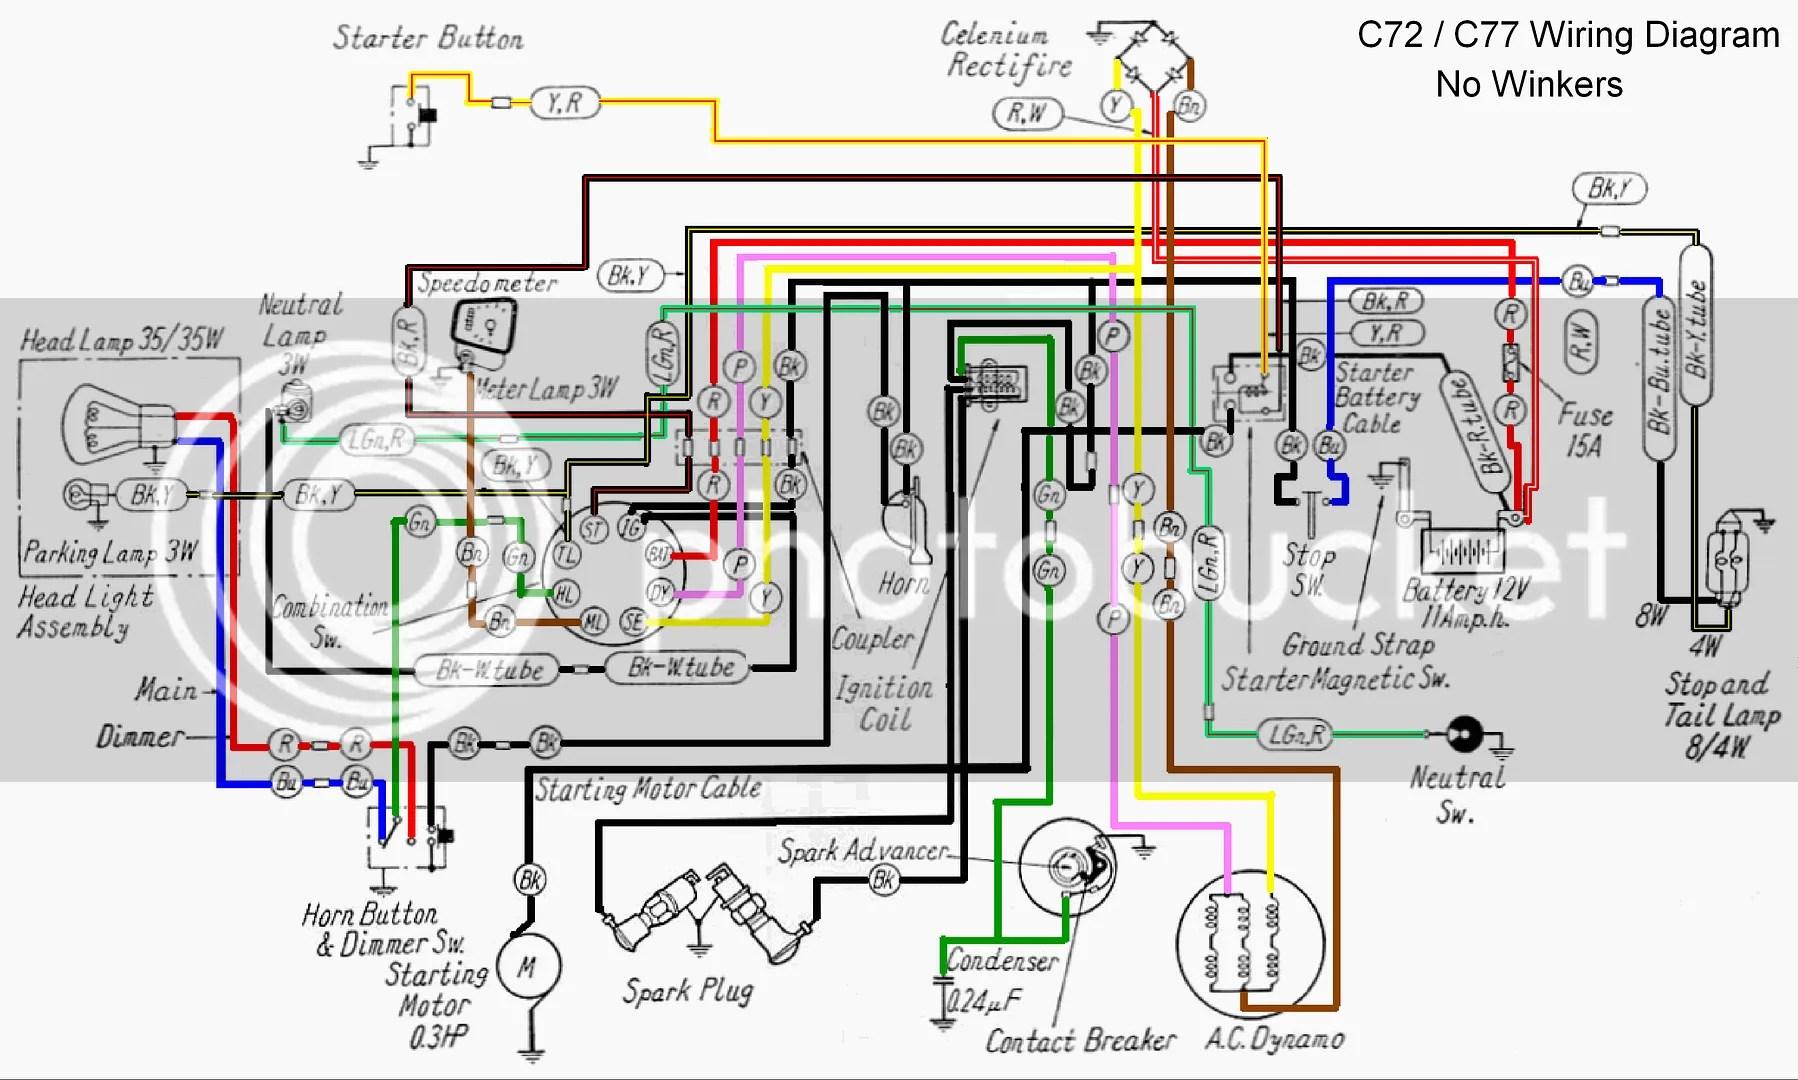 medium resolution of vacuum line diagram ford truck club forum caroldoey wiring diagram dat how to wire dayton barrel